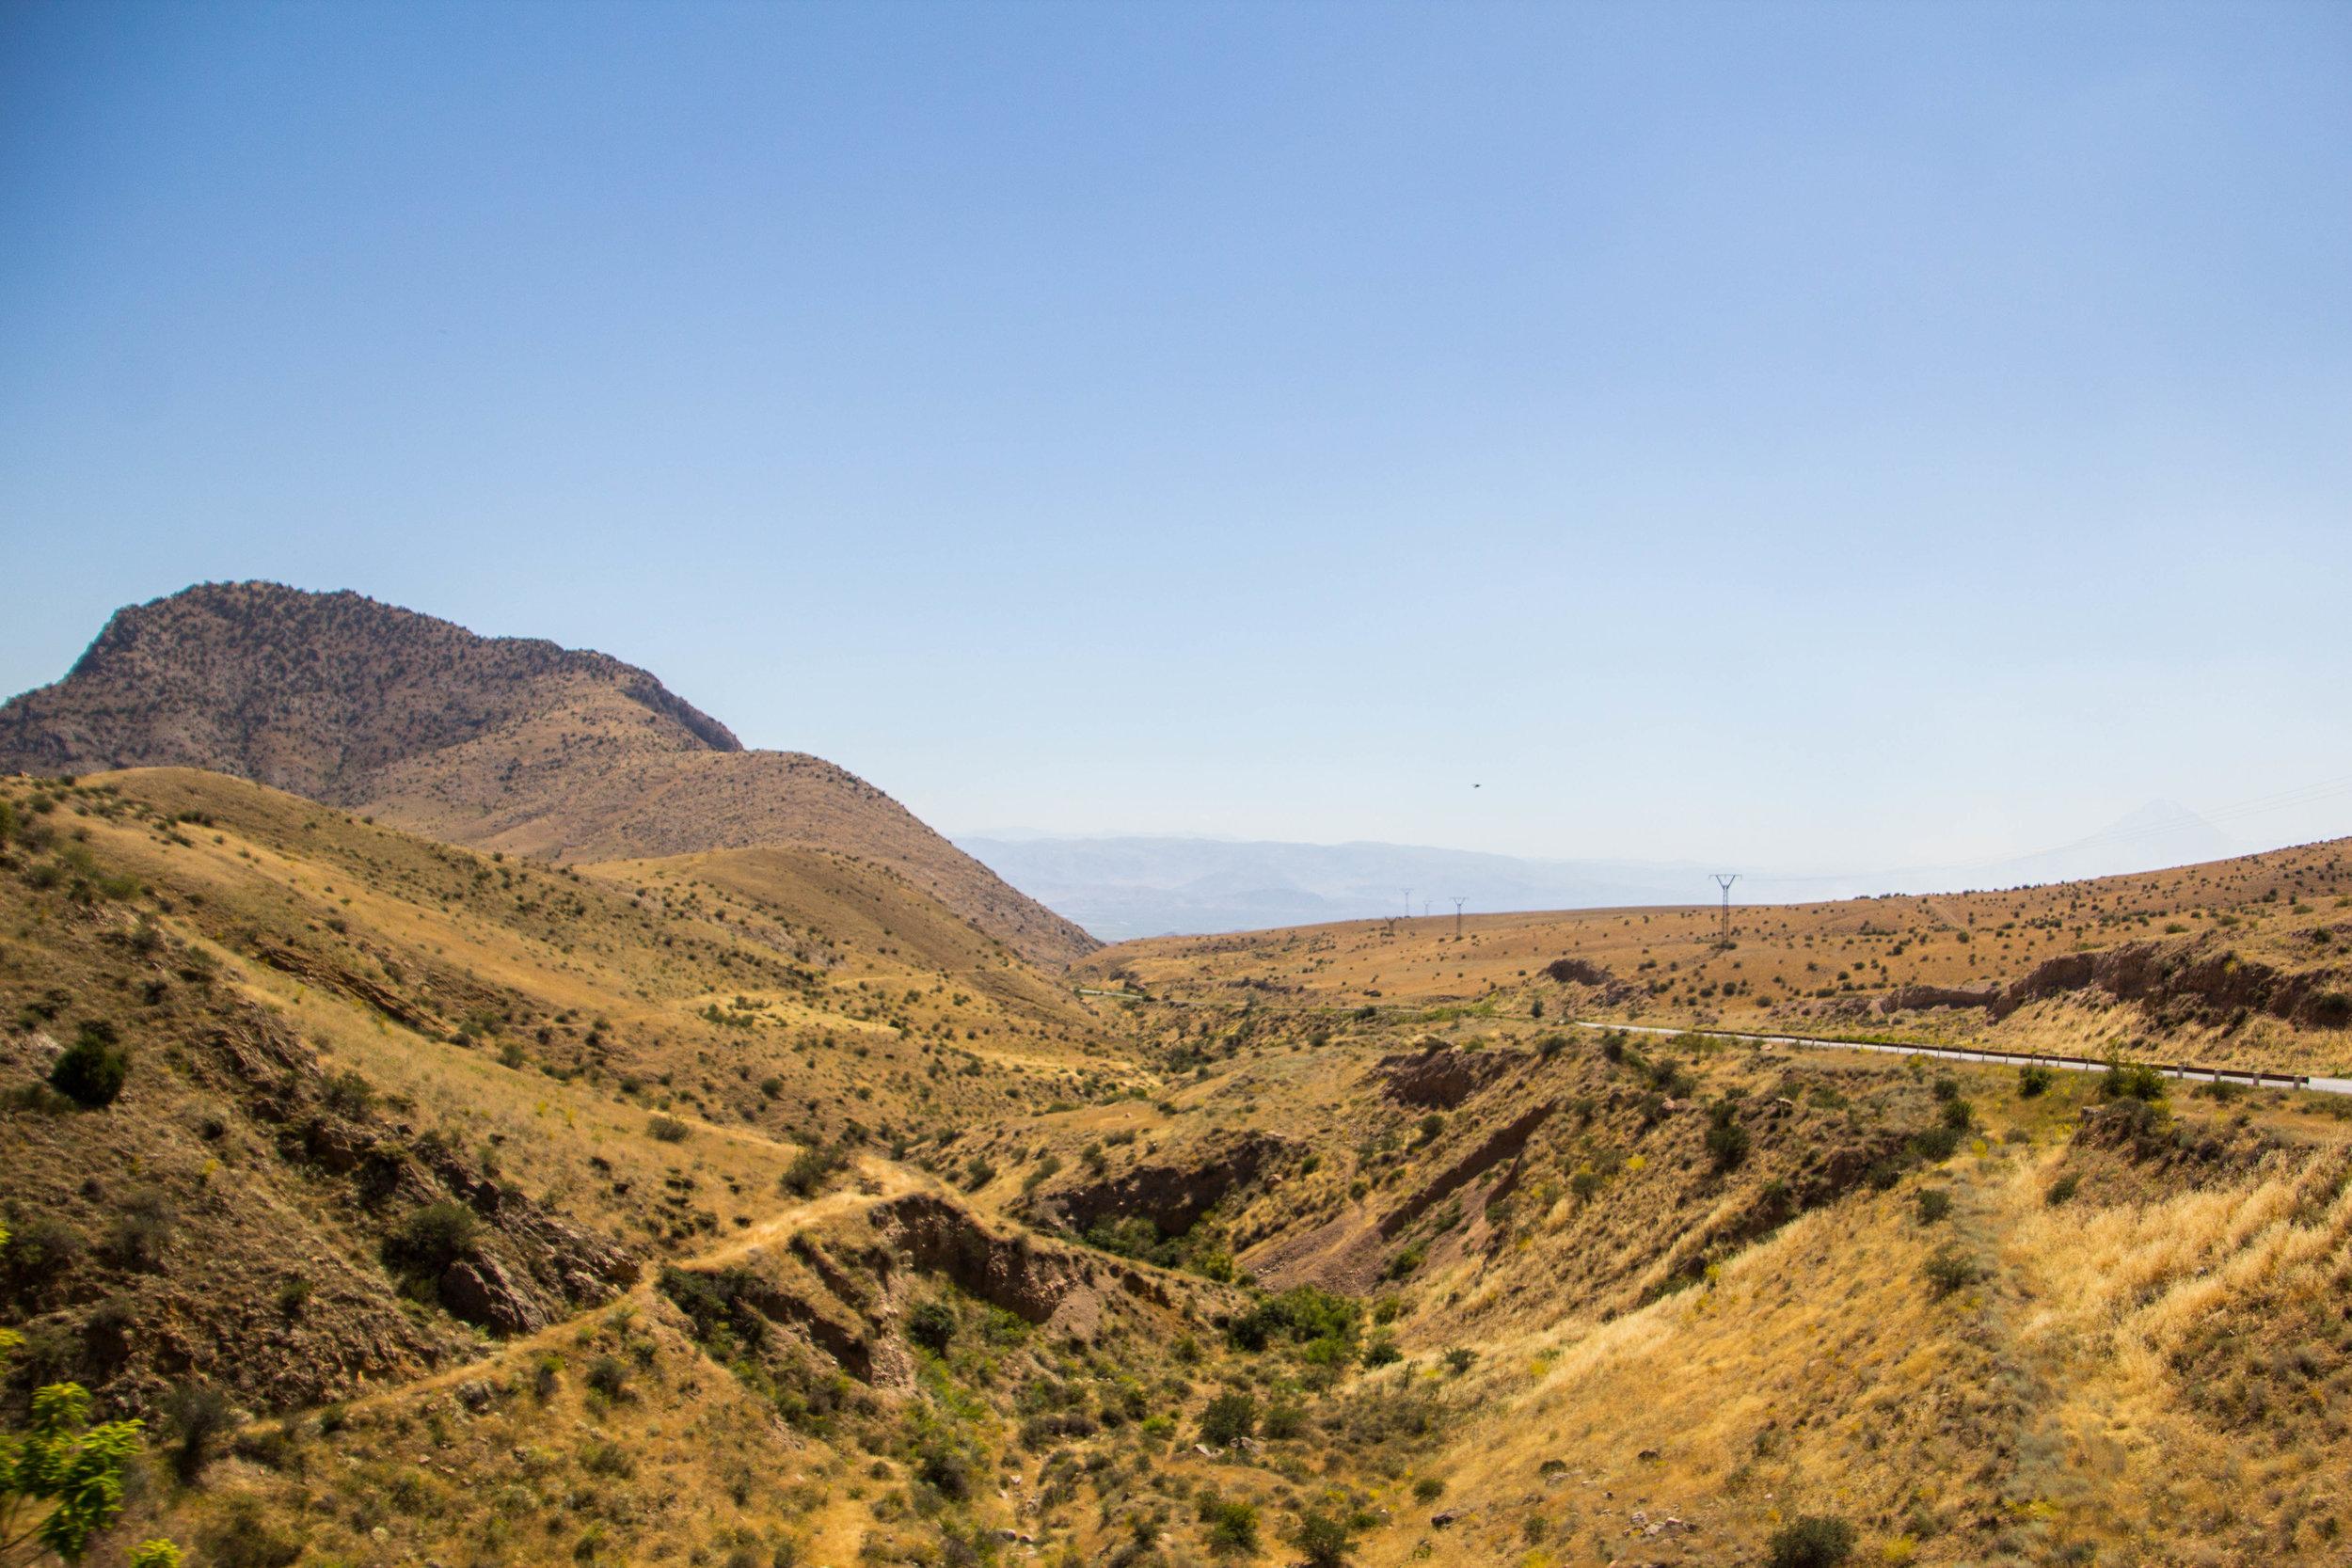 armenia-azerbaijan-southern-border-17.jpg